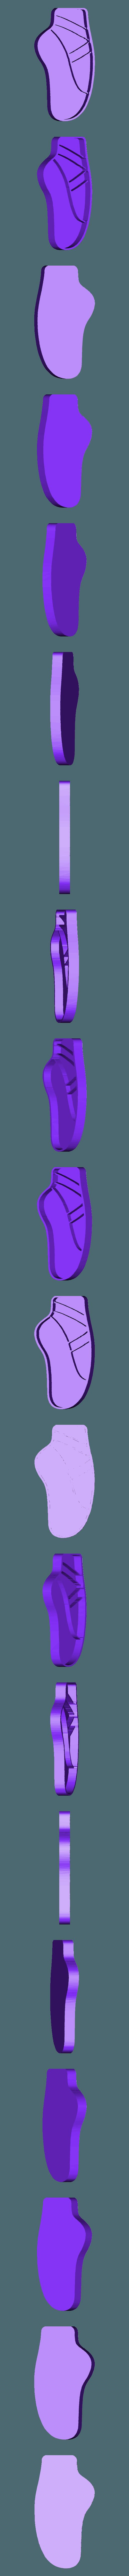 zapato de ballet.stl Download STL file TUTU & SHOE ballet cookie cutter • Model to 3D print, Geralp